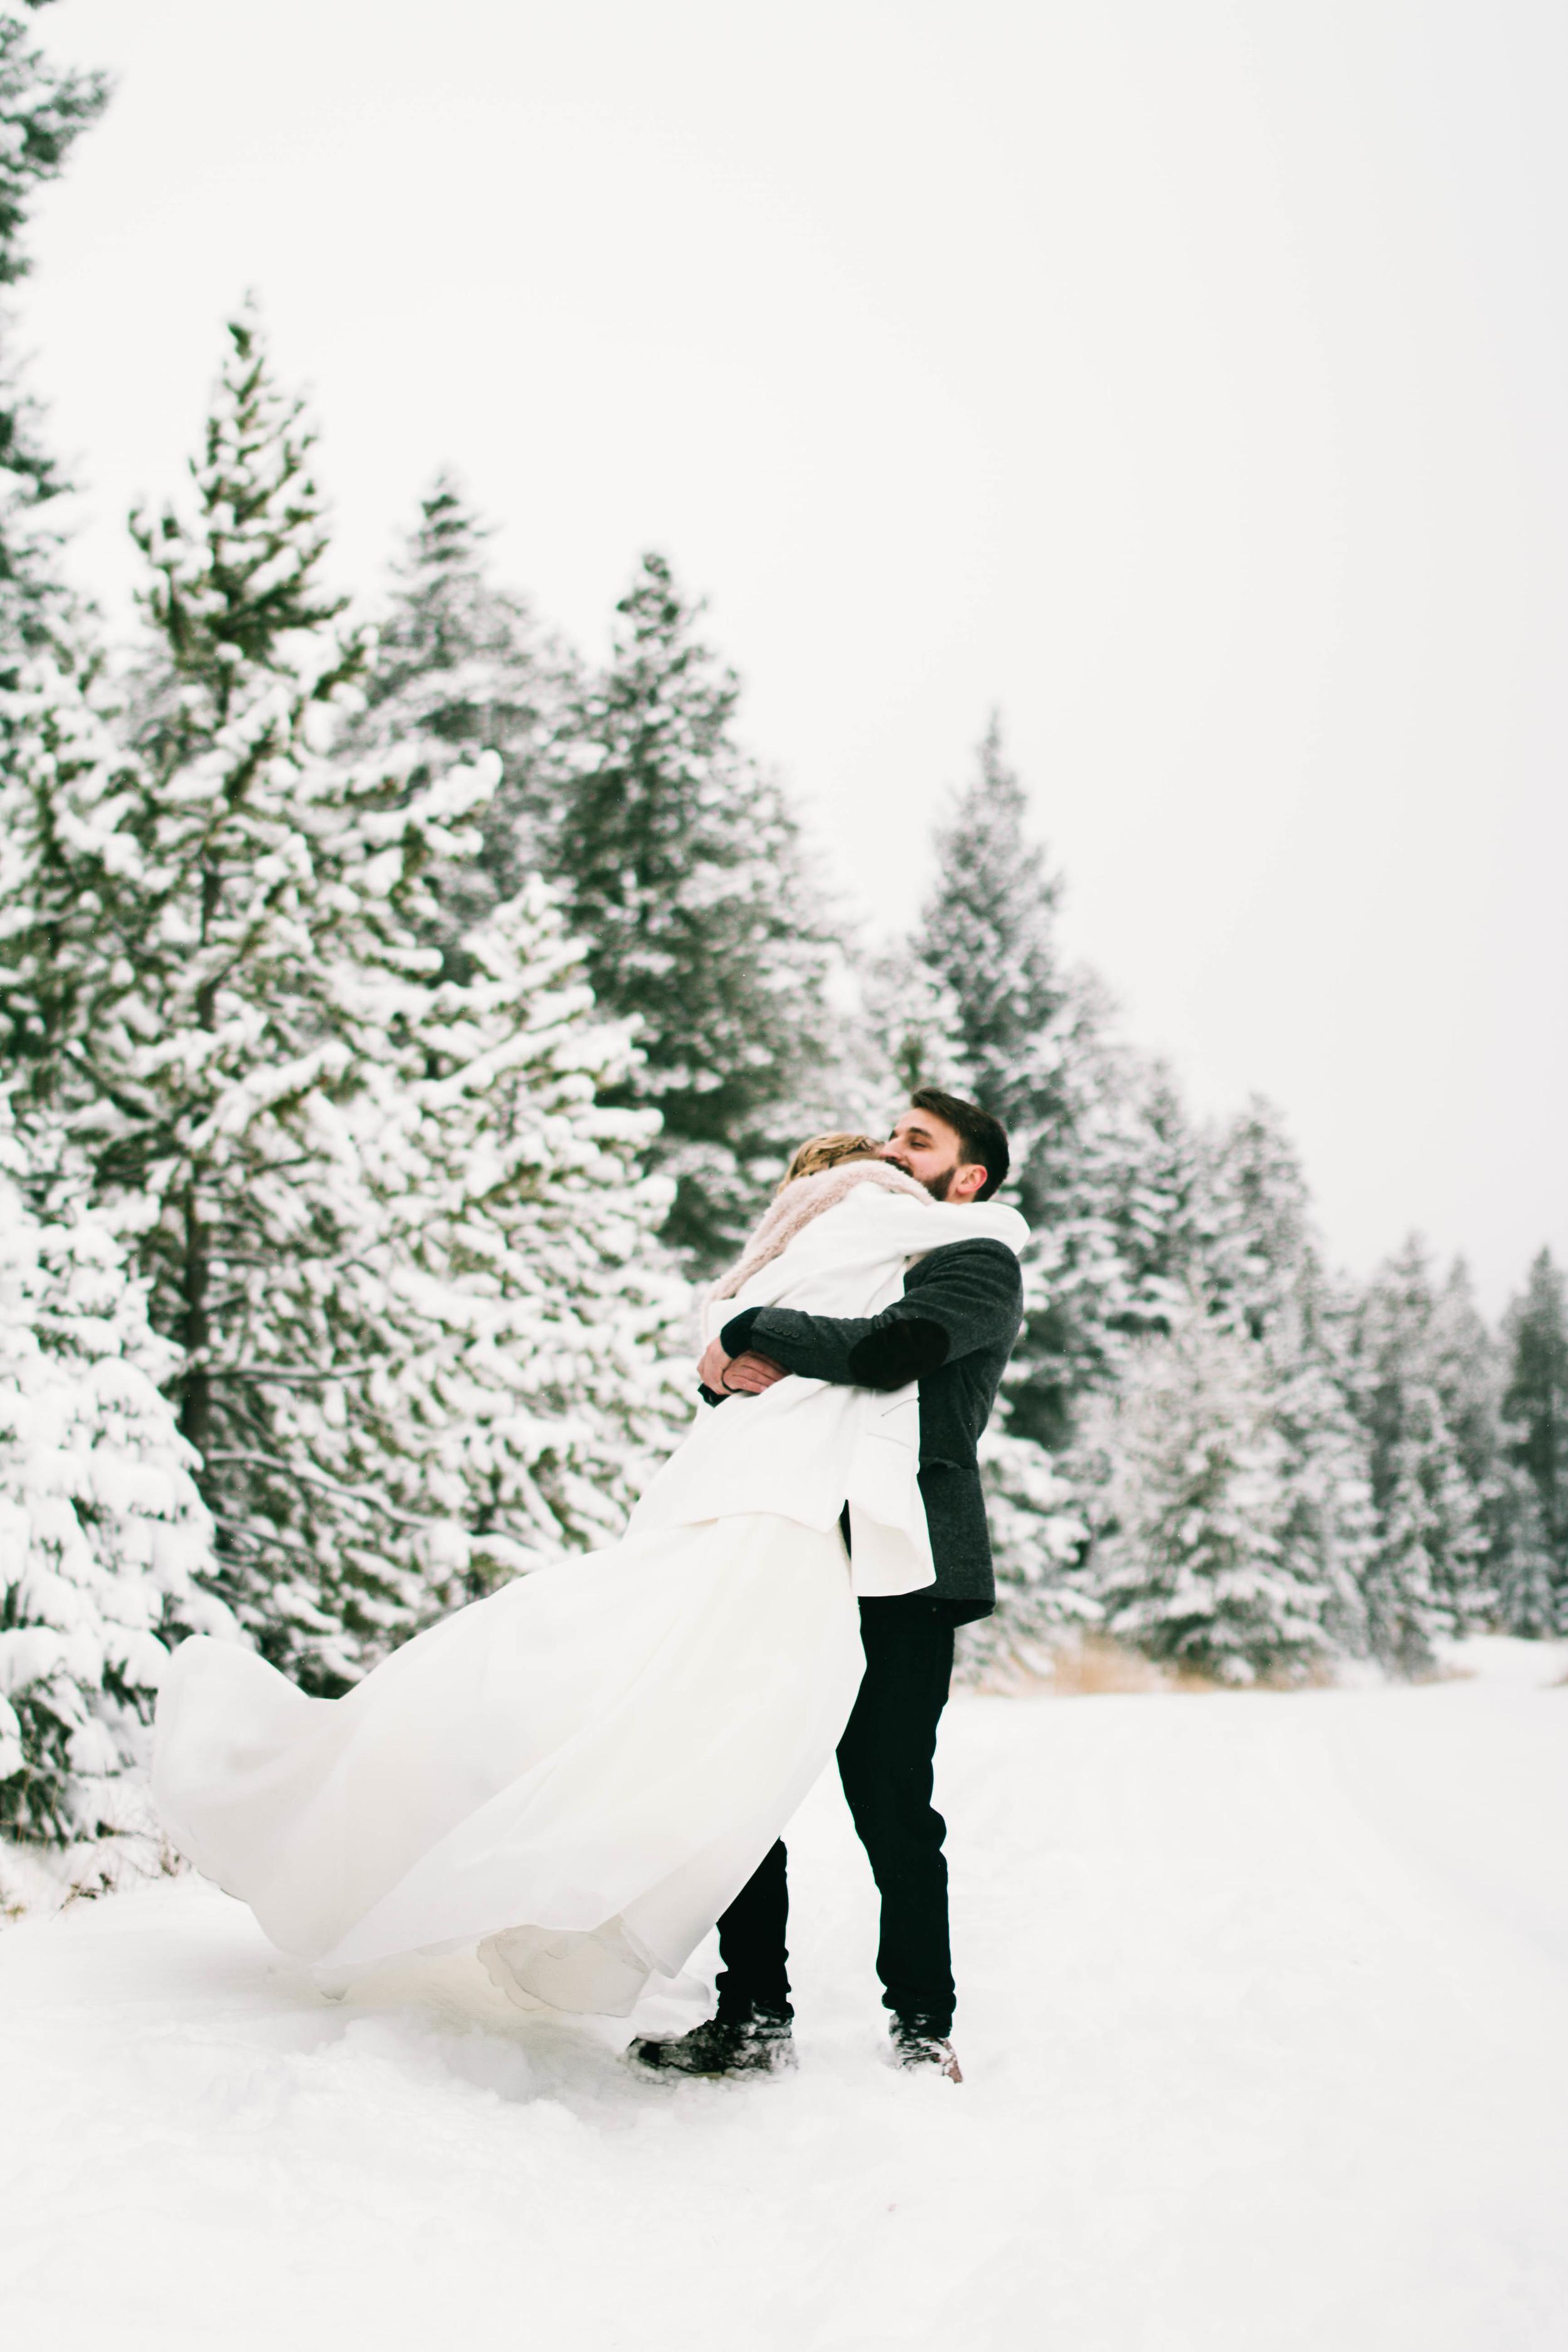 Bonin Wedding - Madeleine Bonin Photography-5801.jpg